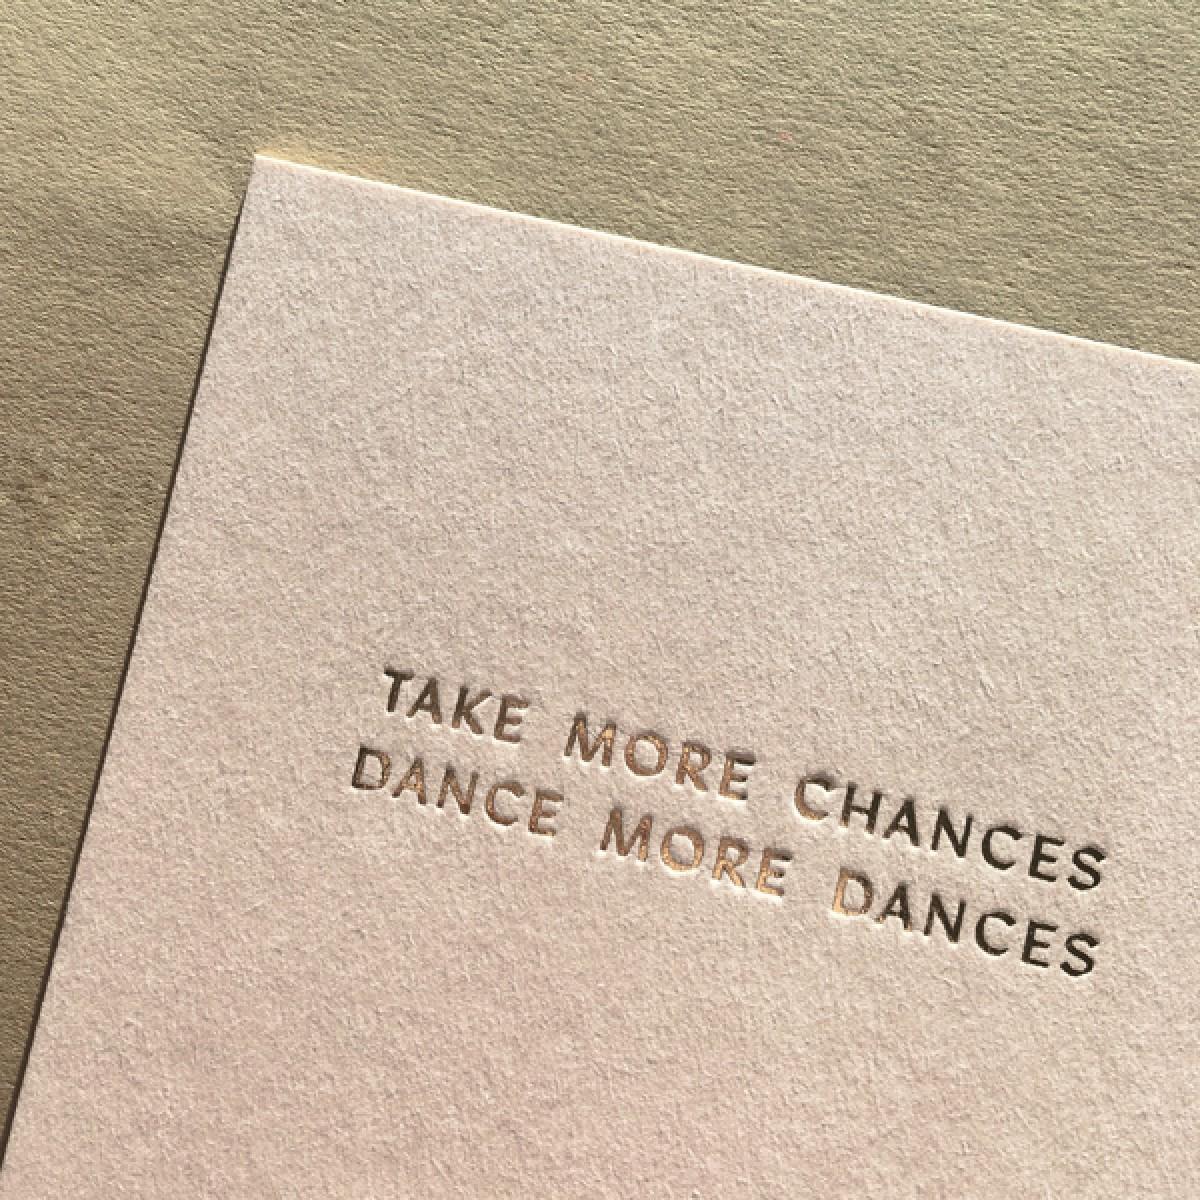 TAKE MORE CHANCES, DANCE MORE DANCES - A5 PRINT - LETTERPRESS